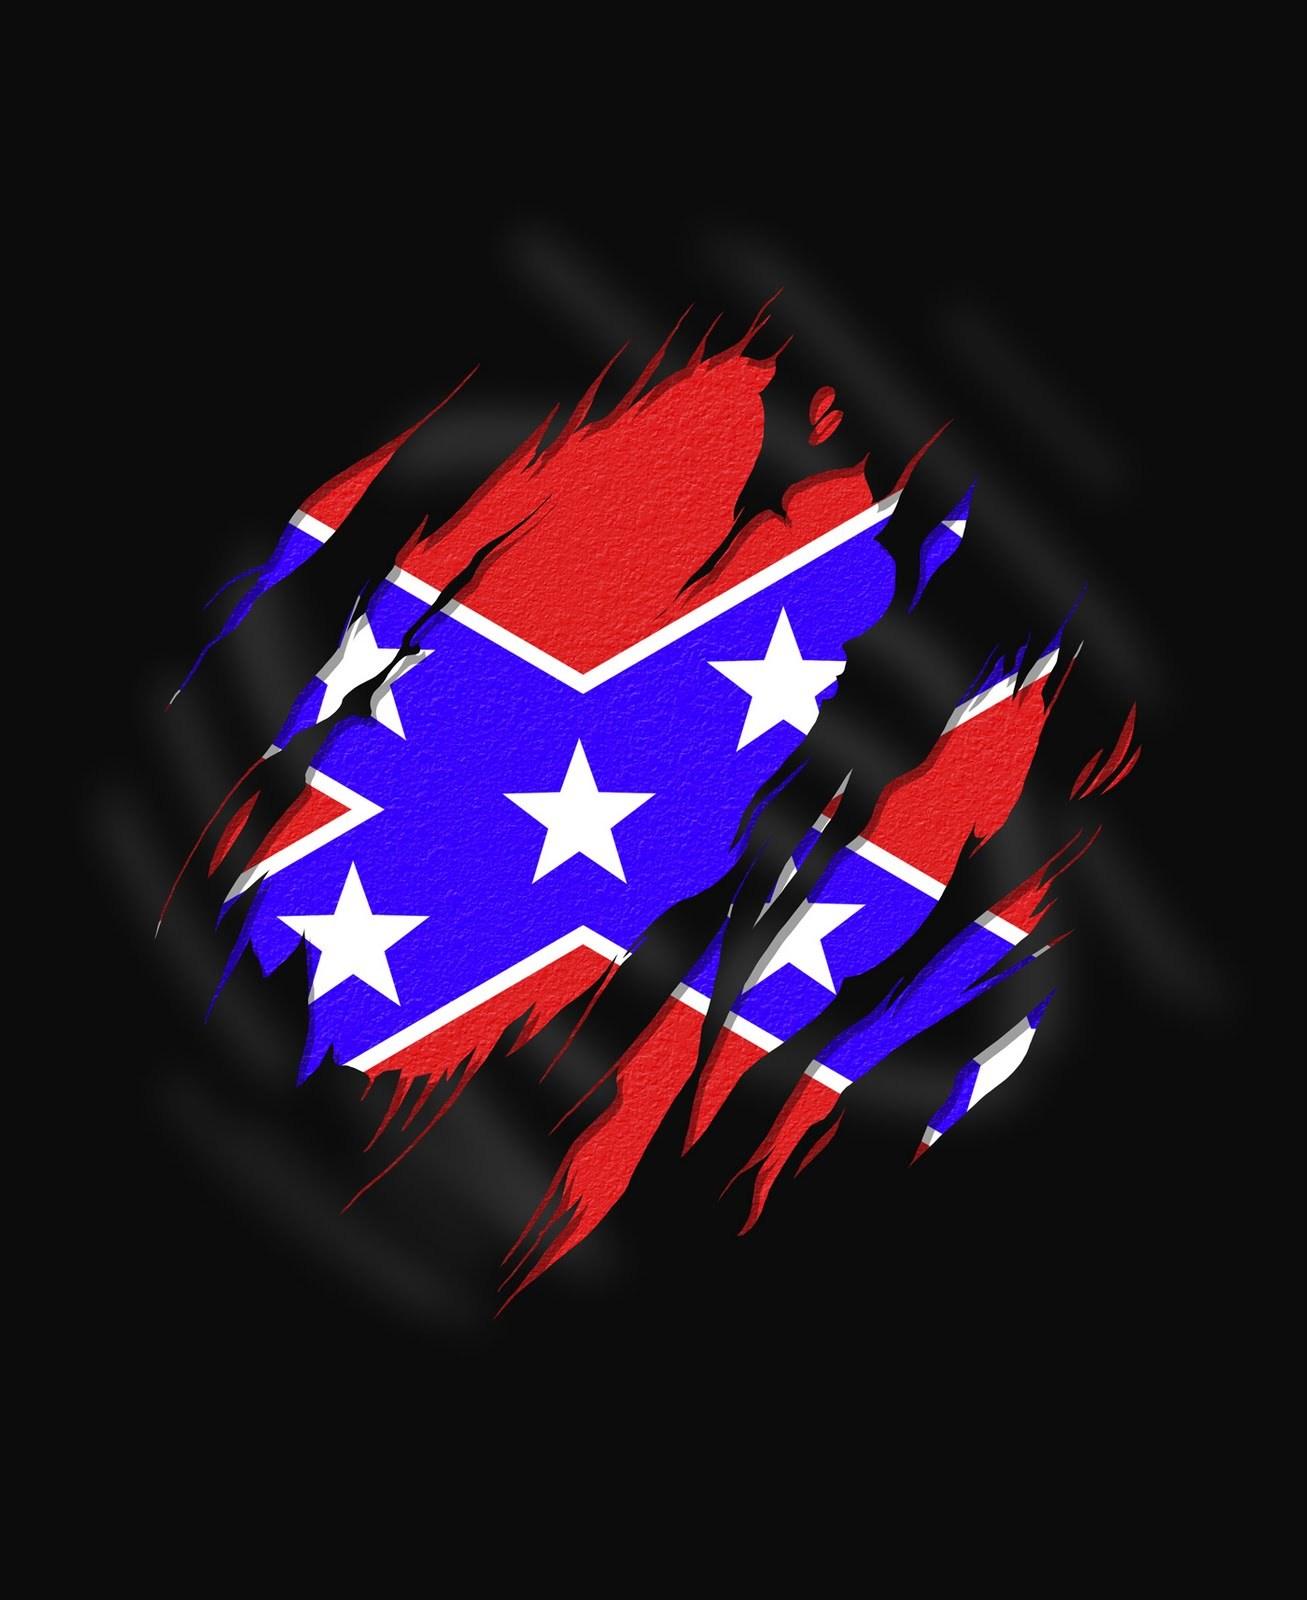 18747 Заставки и Обои Флаги на телефон. Скачать Флаги, Фон картинки бесплатно